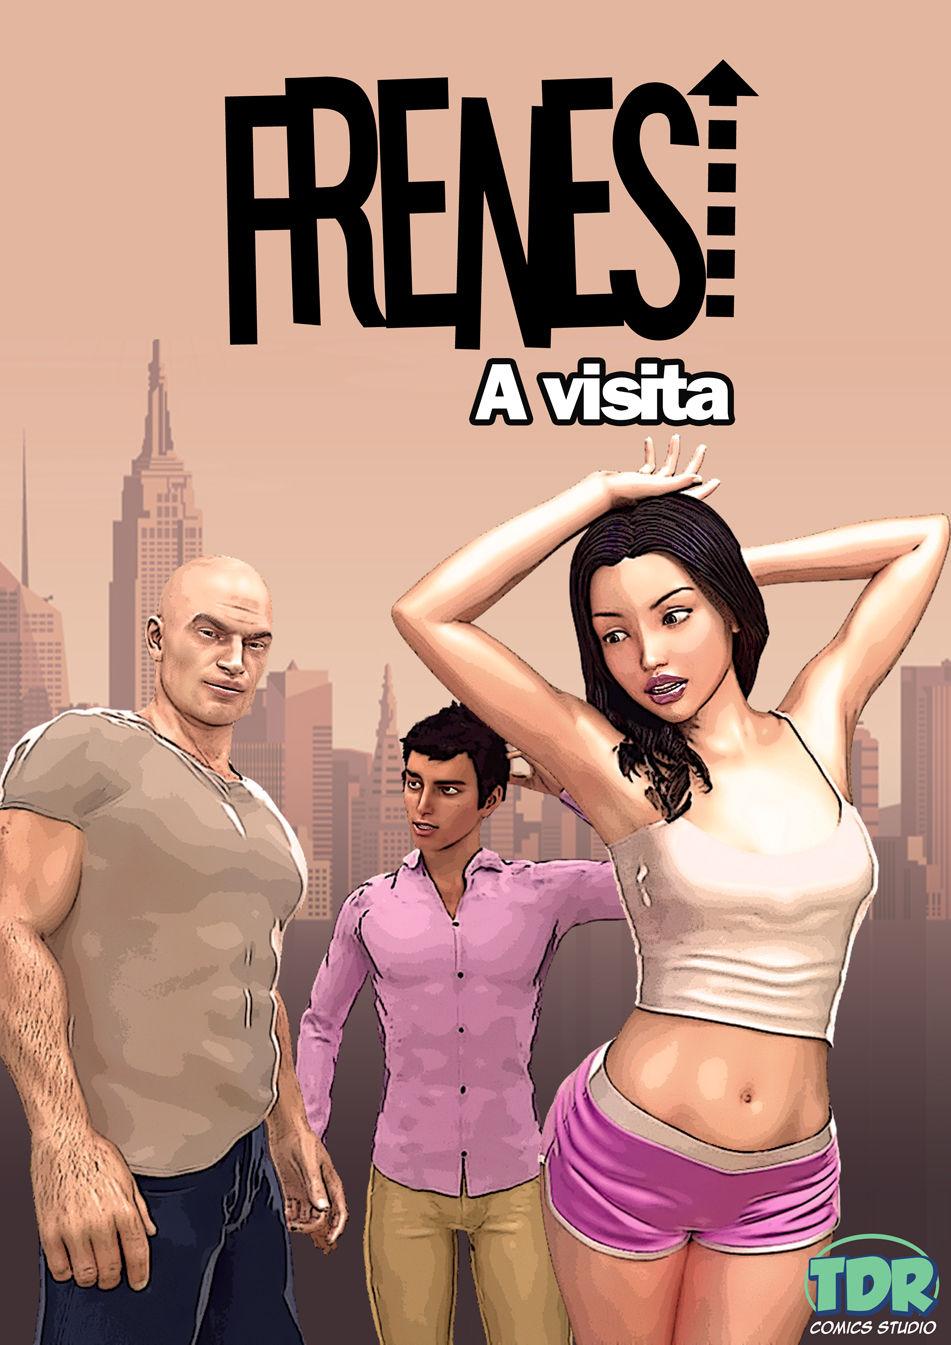 Frenesi 1[A visita] – HQ Comics